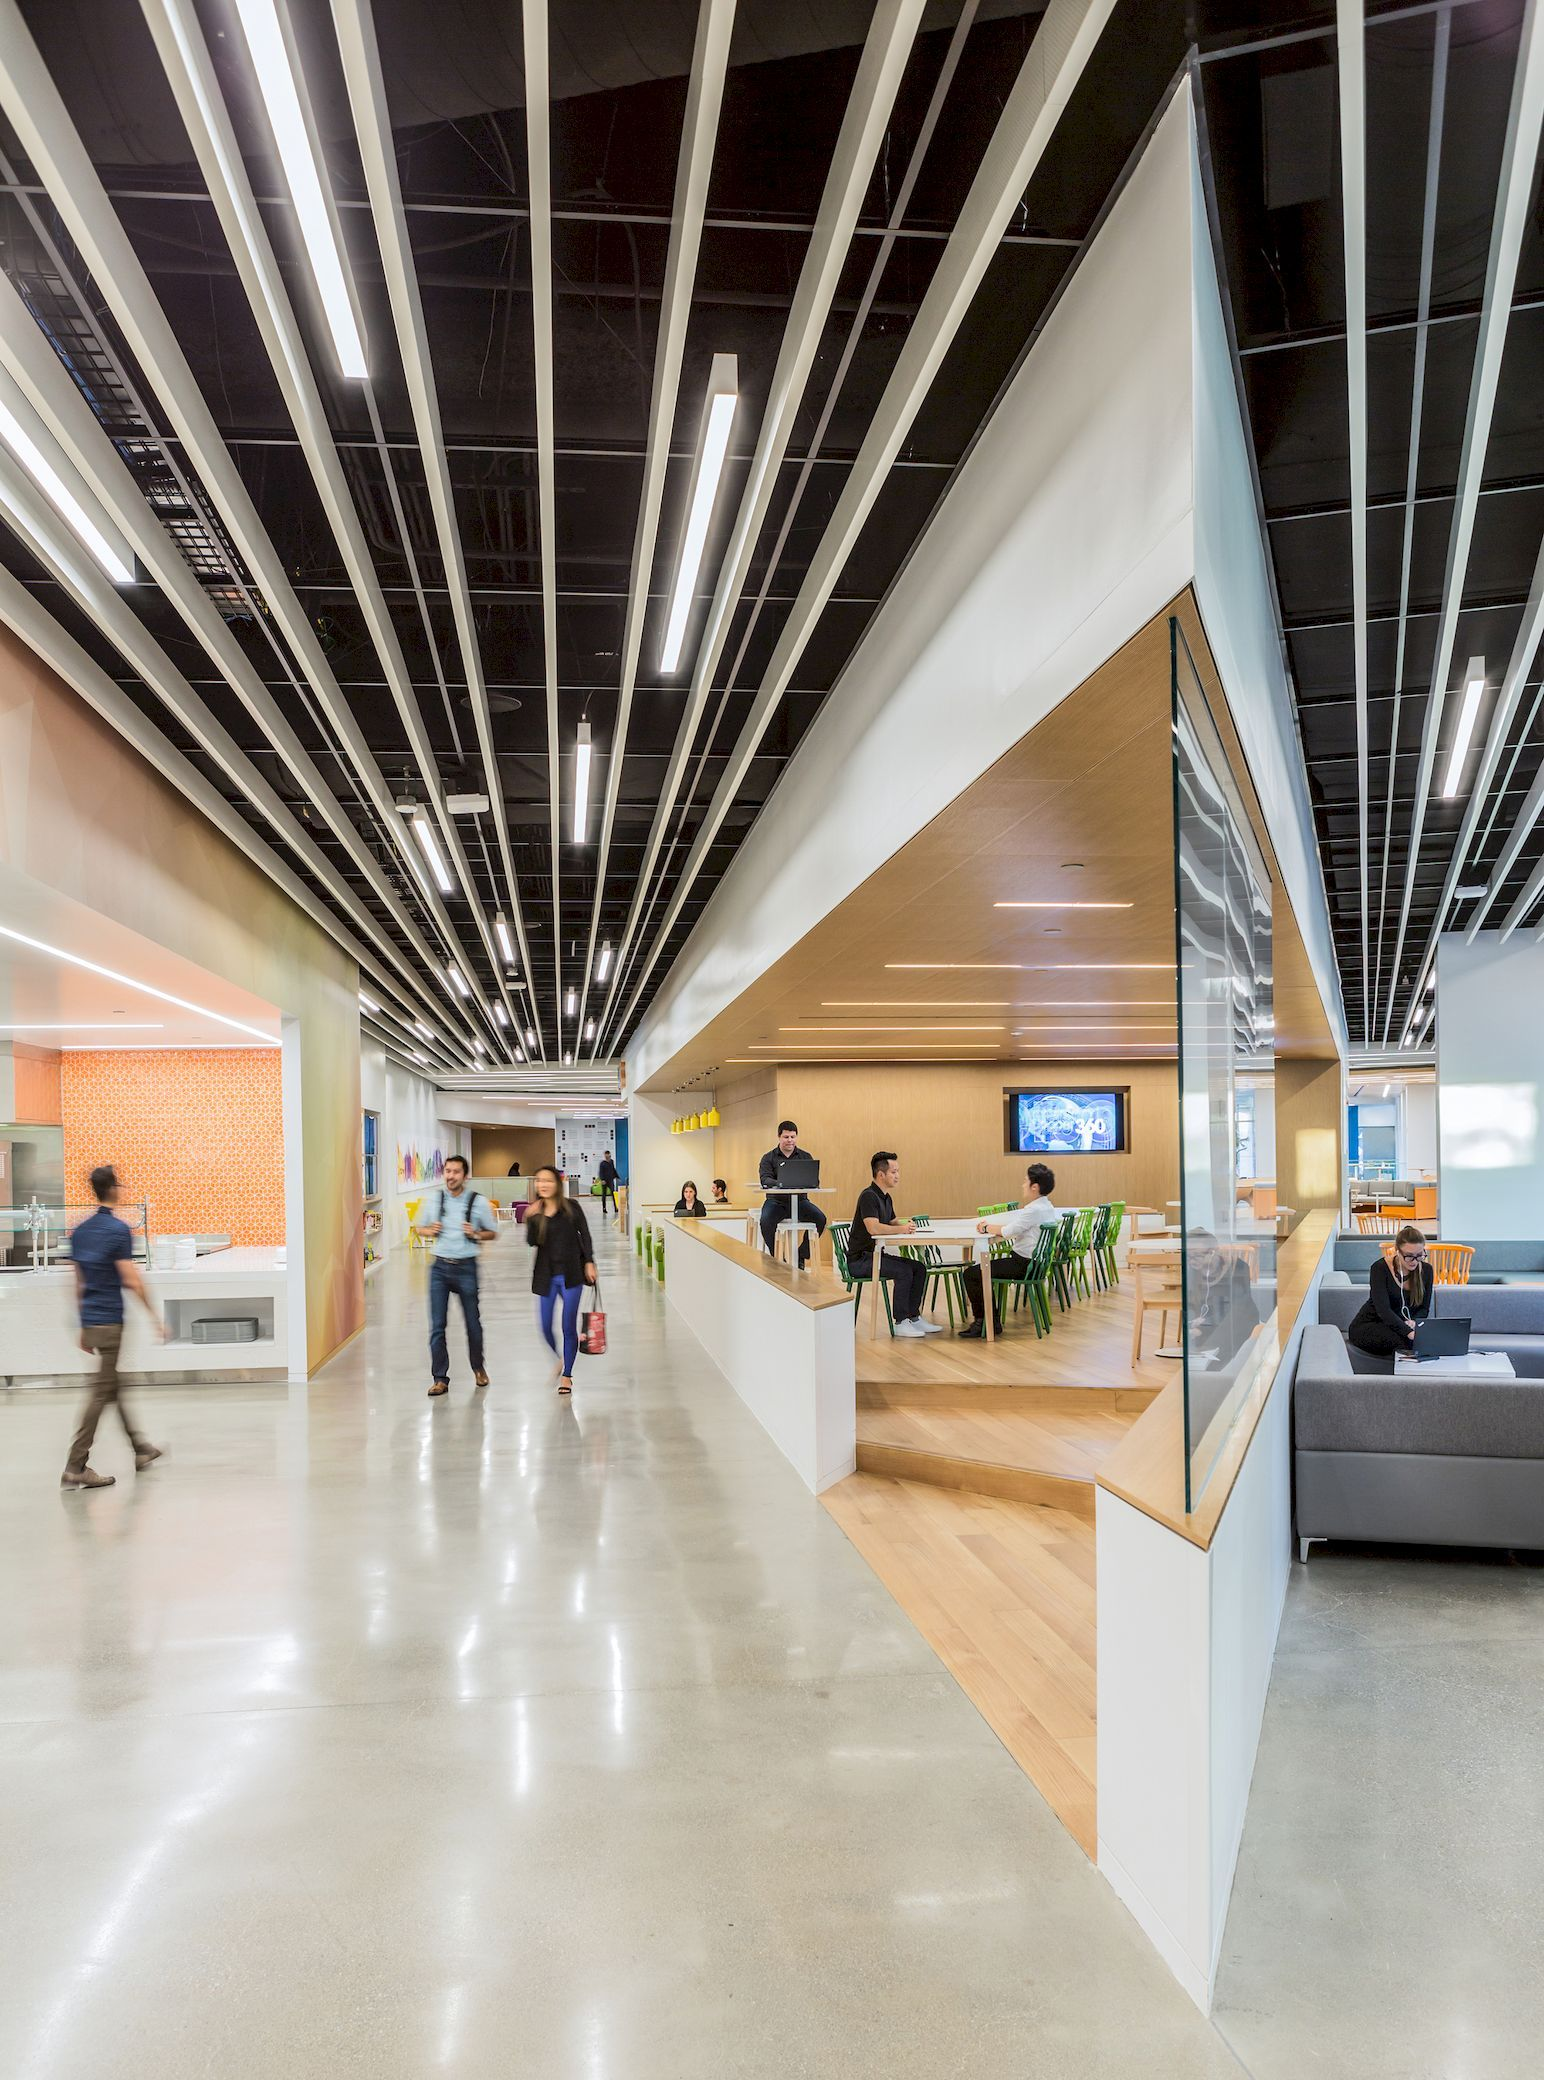 Adobe Headquarters Renovation With Images Interior Design